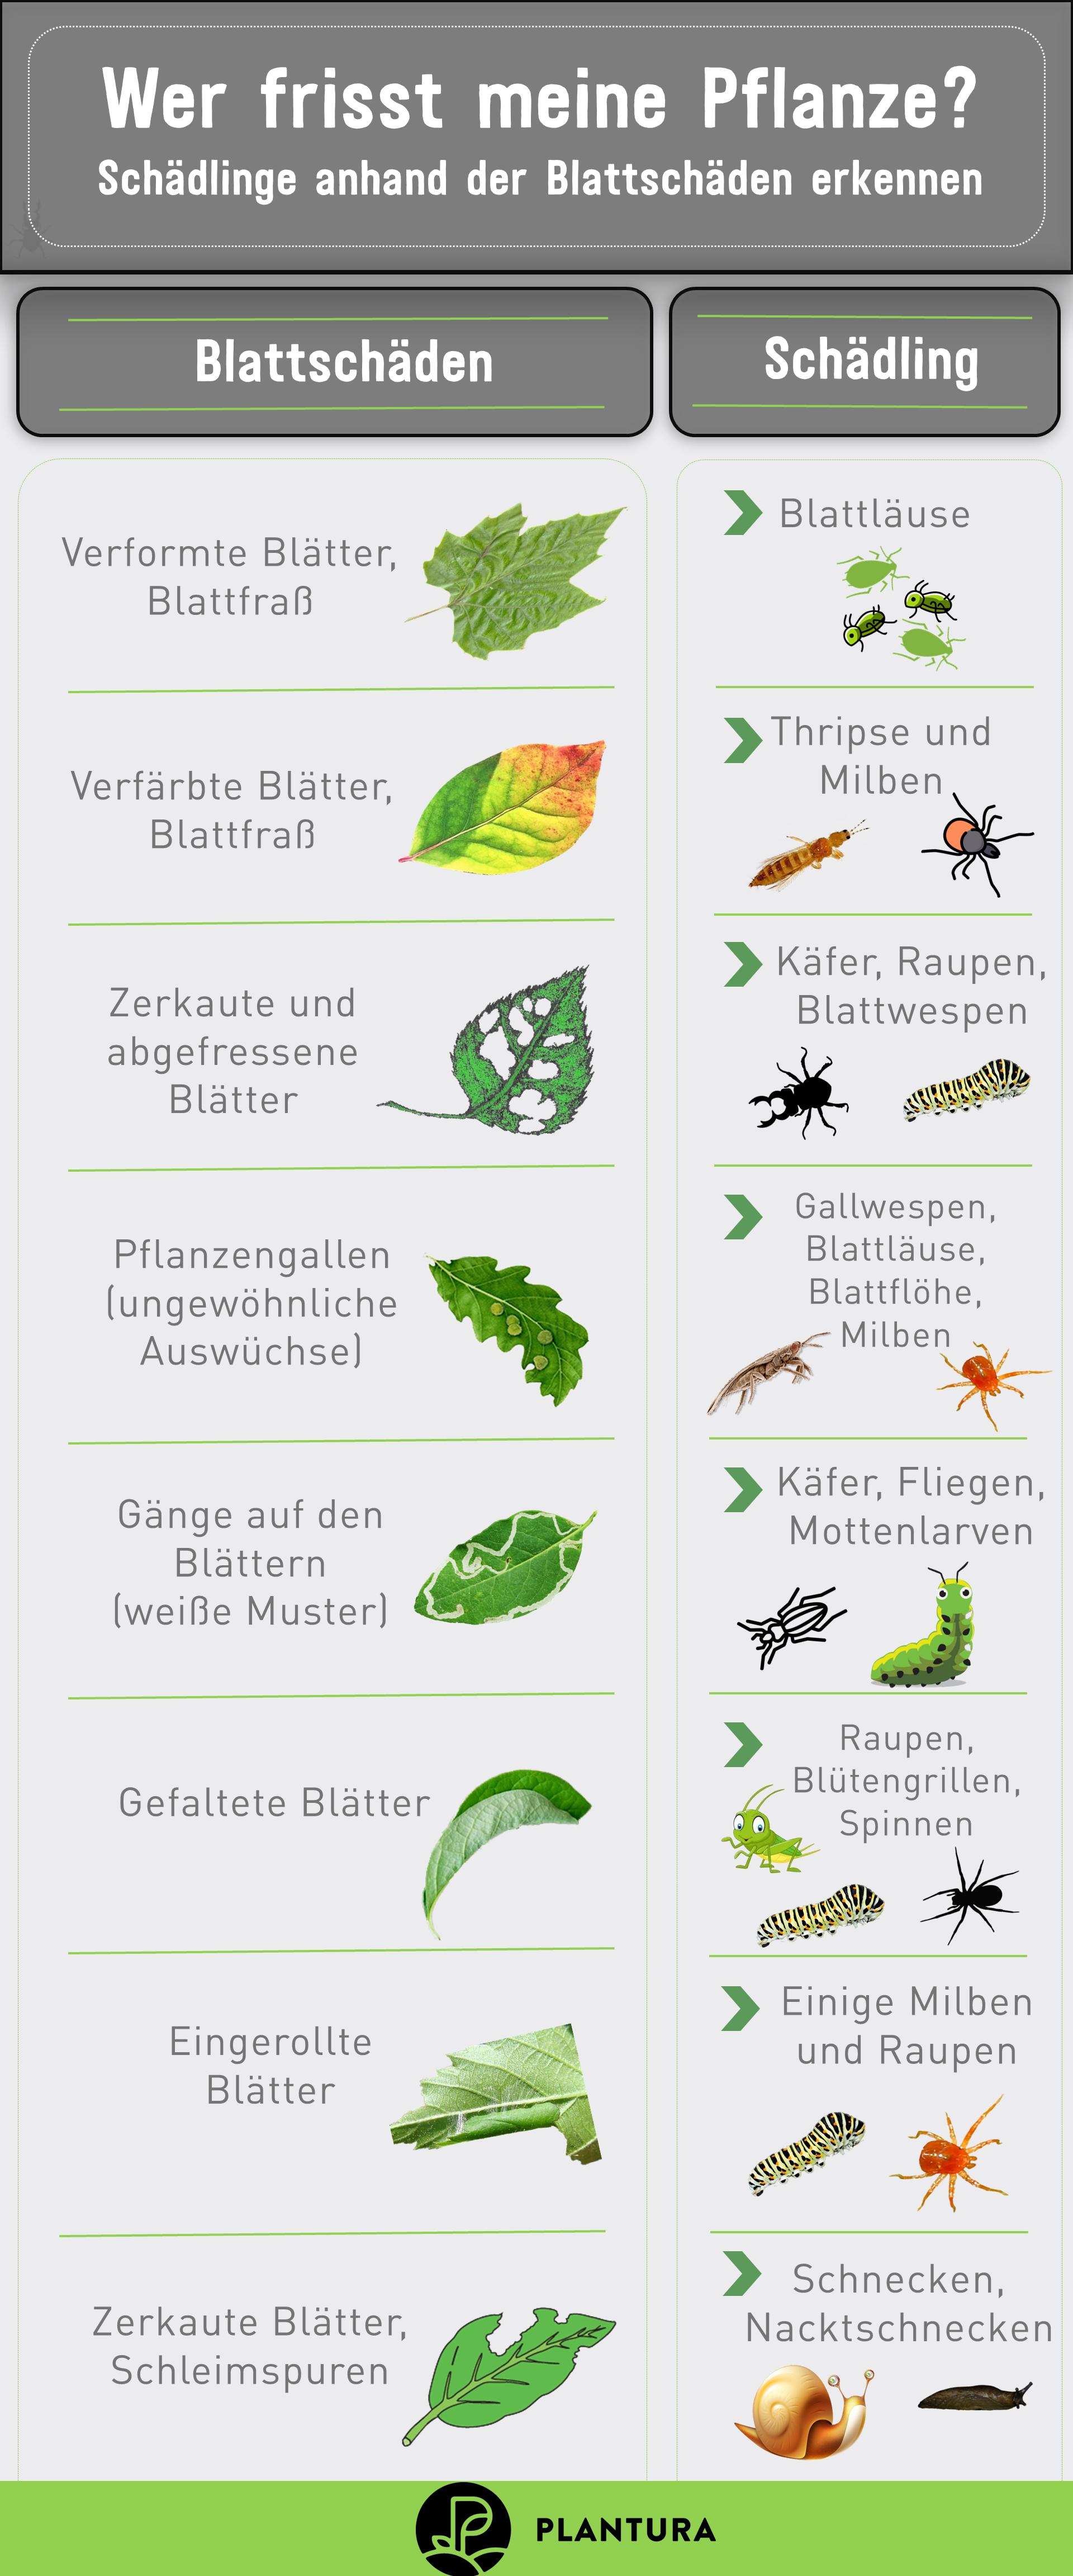 10 Hausmittel Gegen Schadlinge Im Garten Plantura Garten Gegen Hausmittel Plantura Schadlinge In 2020 Potted Plants Patio Ideas Potted Plants Patio Plant Pests